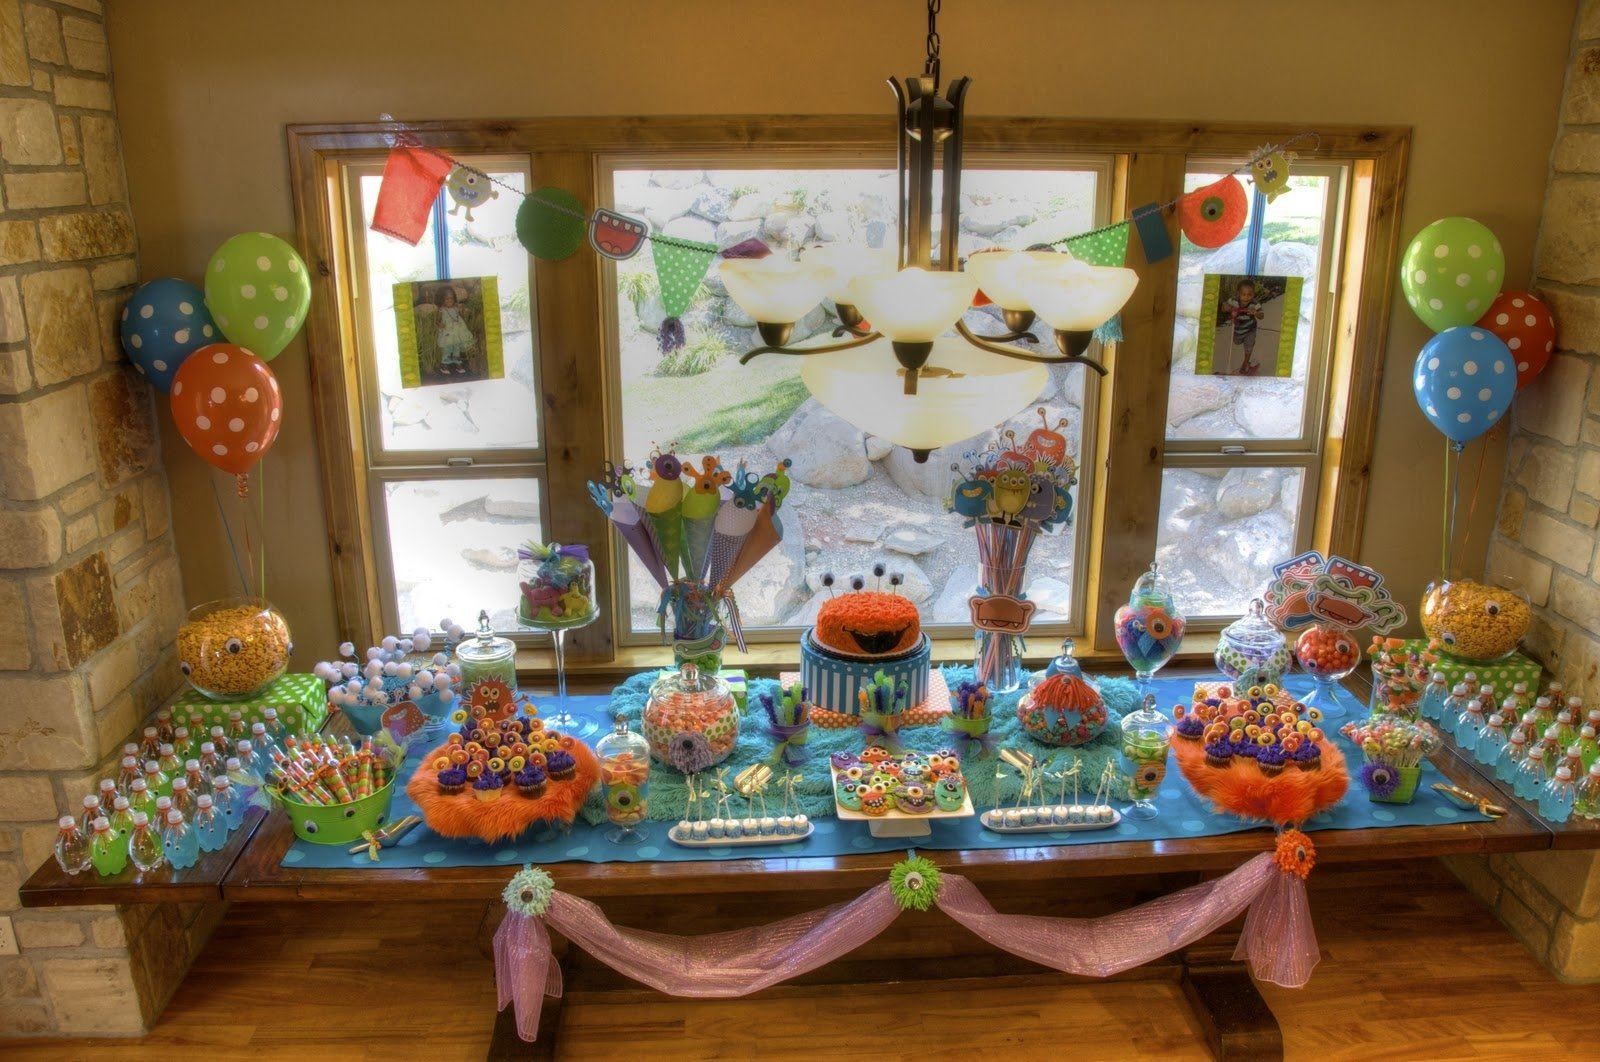 10 Lovely 4 Yr Old Boy Birthday Party Ideas cute year birthday party ideas entertainment ideas for visit 46 2021